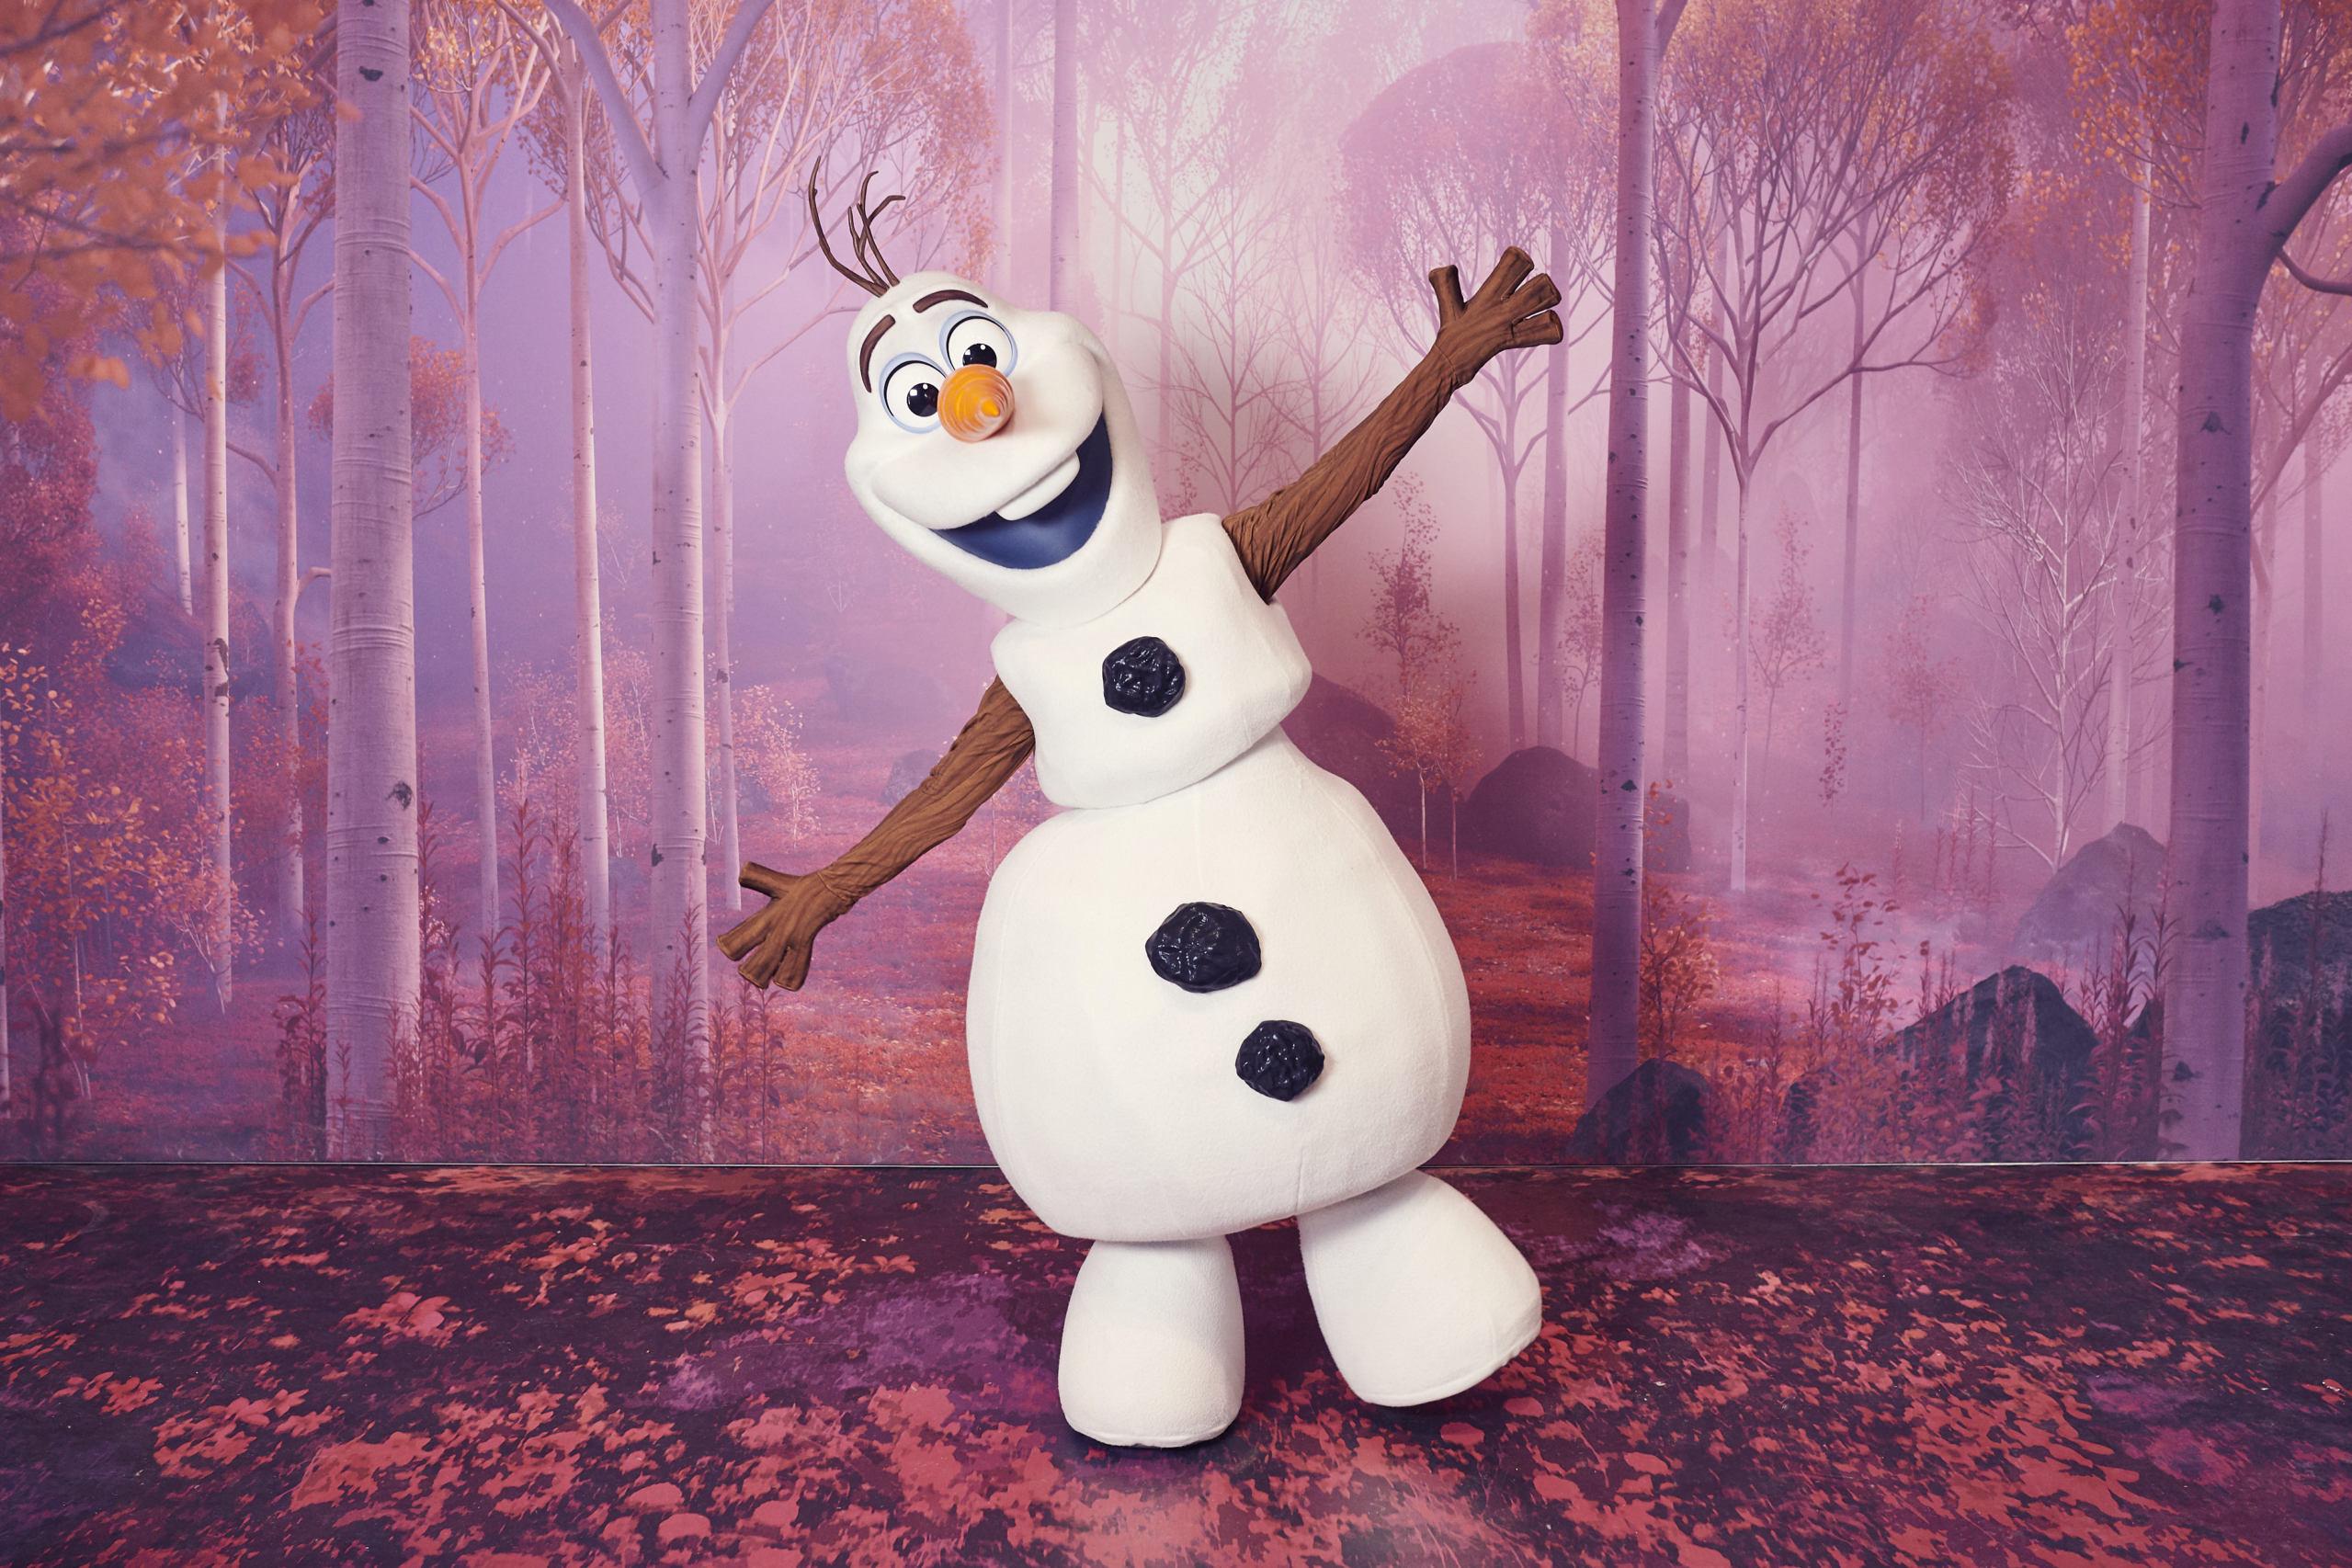 2019 - Animation Celebration dal 17 novembre - Pagina 2 Frozen26